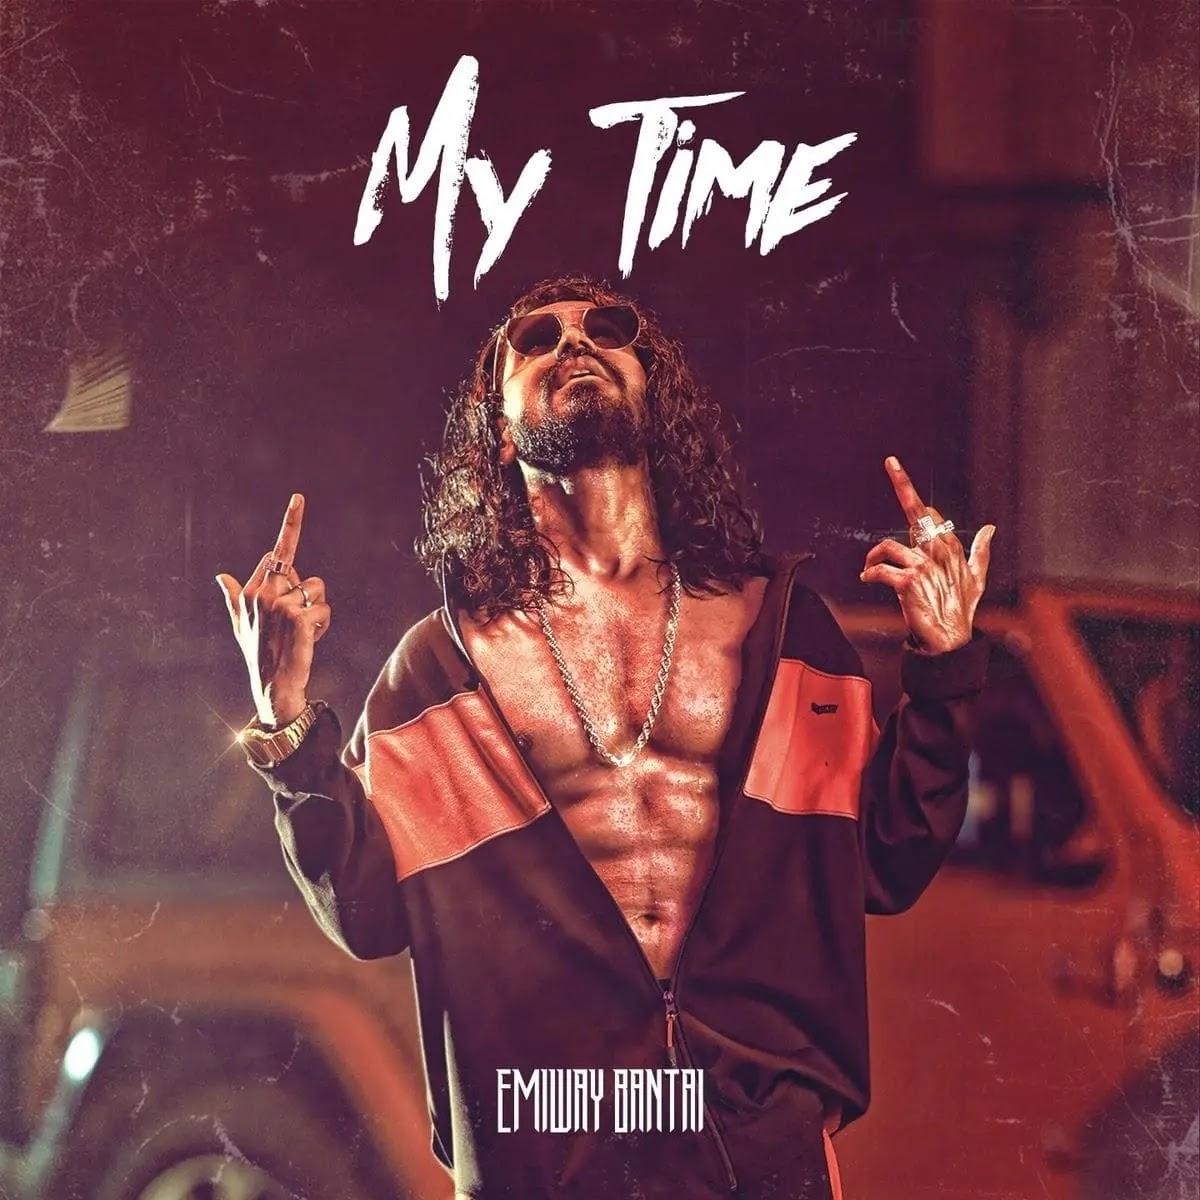 My Time Emiway Bantai Mp3 Song Download 320kbps Free